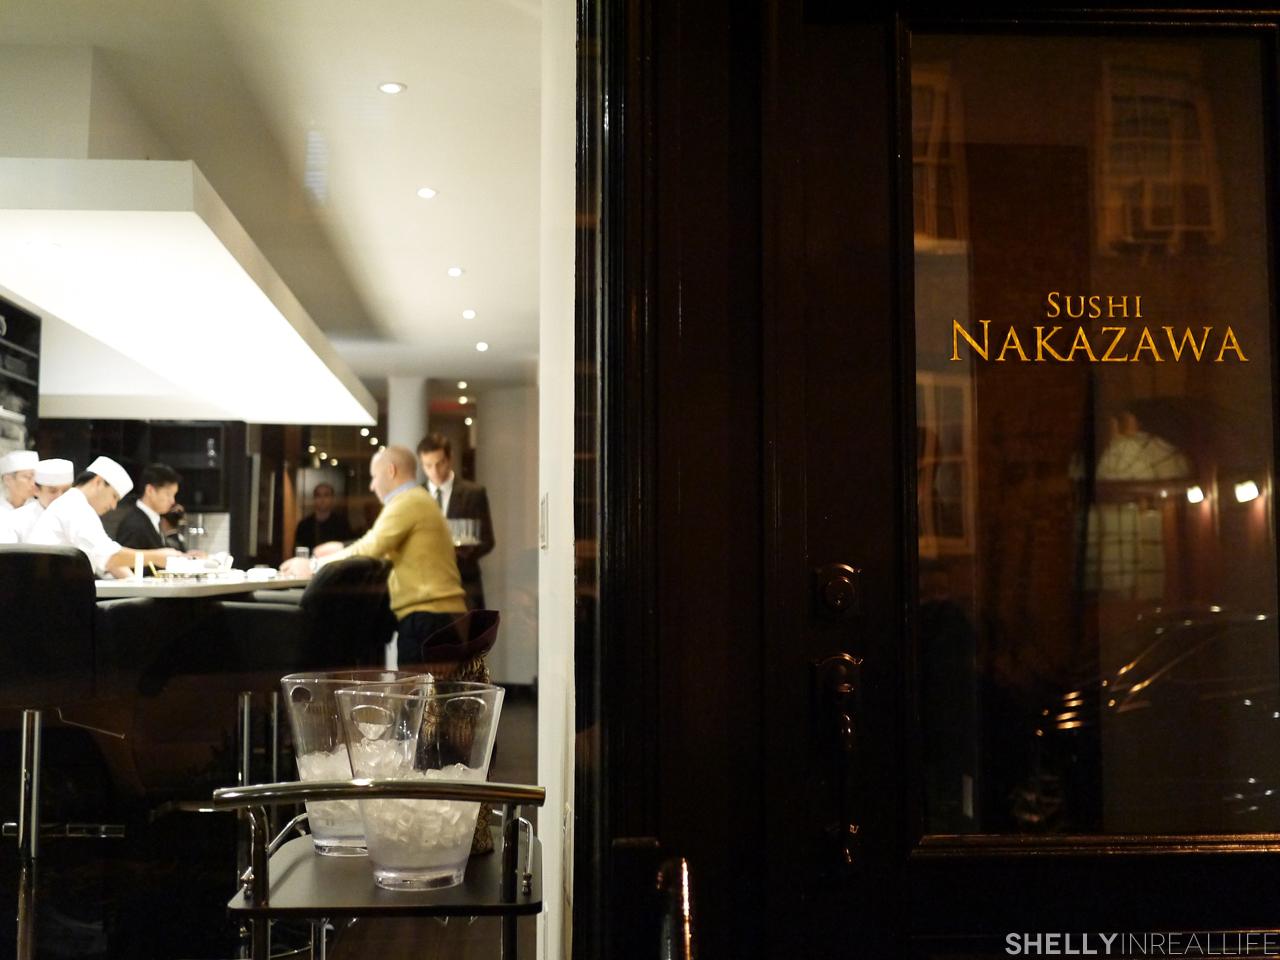 Nyc Sushi Nakazawa A Photo Diary Of, Sushi Nakazawa Dining Room Vs Bar